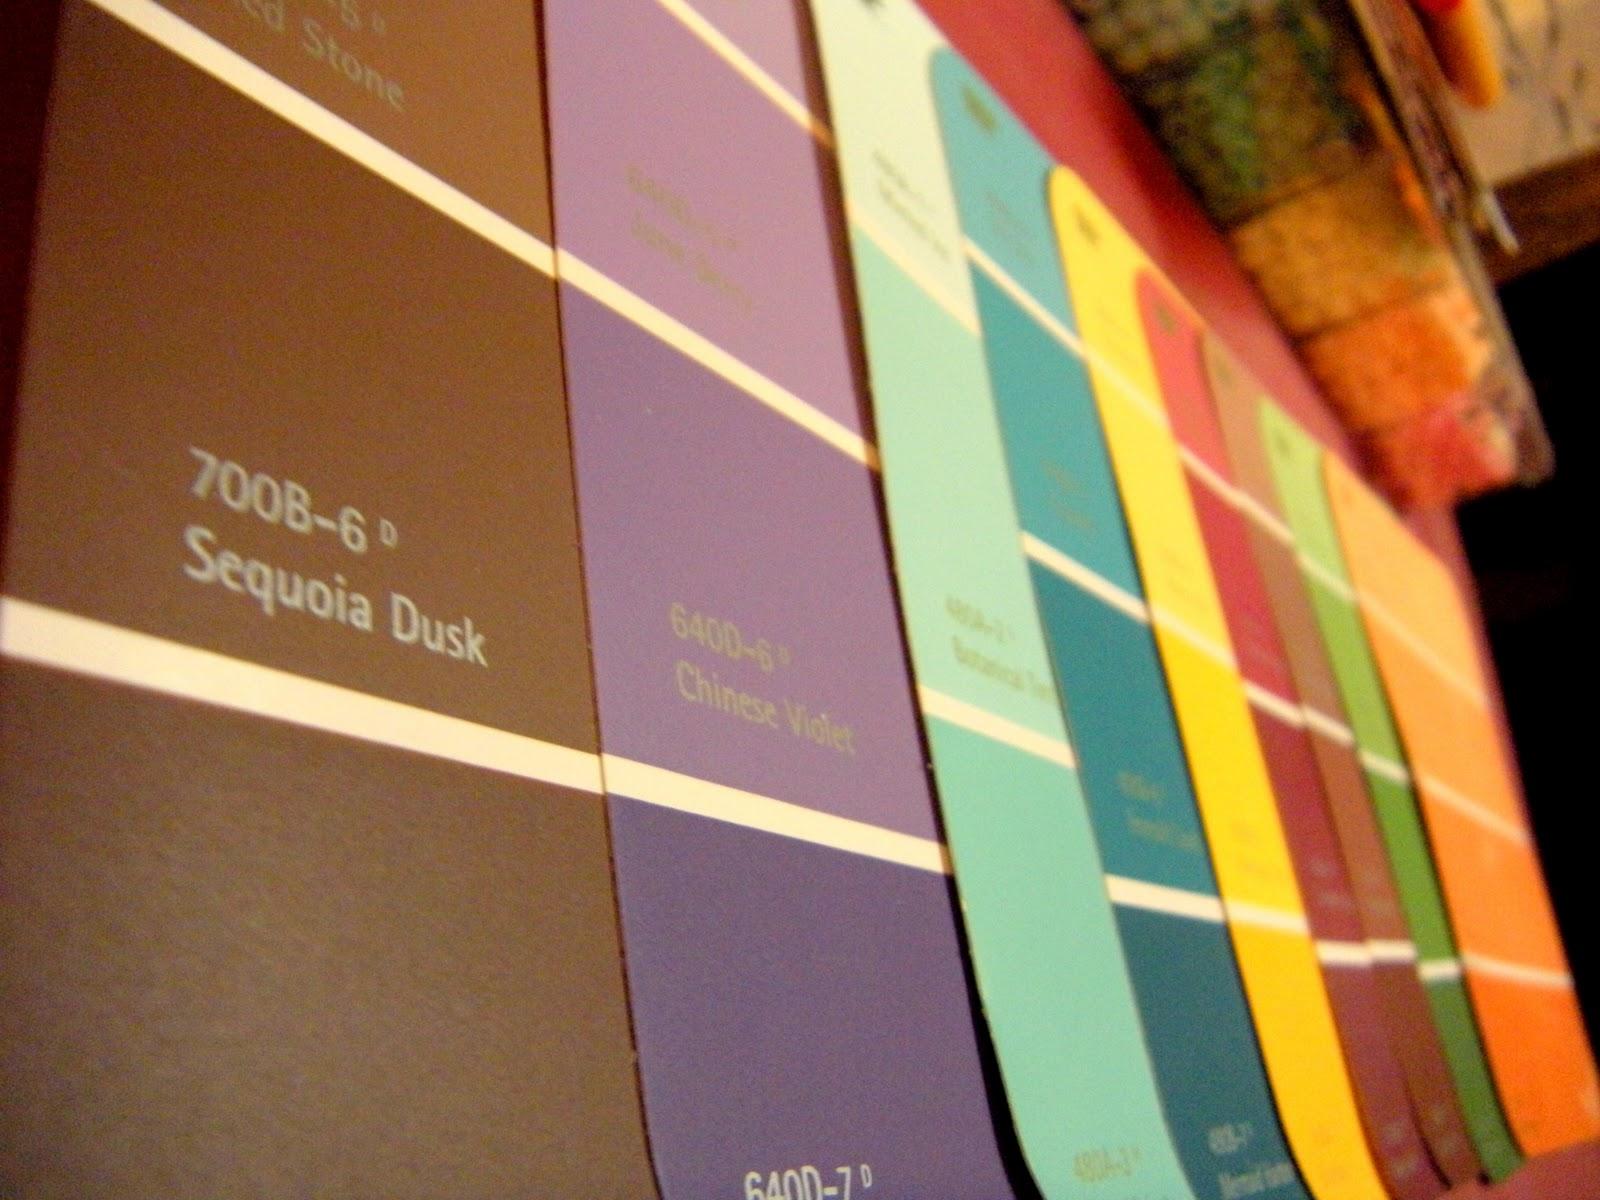 Paint Chips Home Depot Green Metallic Interior Paint Good Paint At